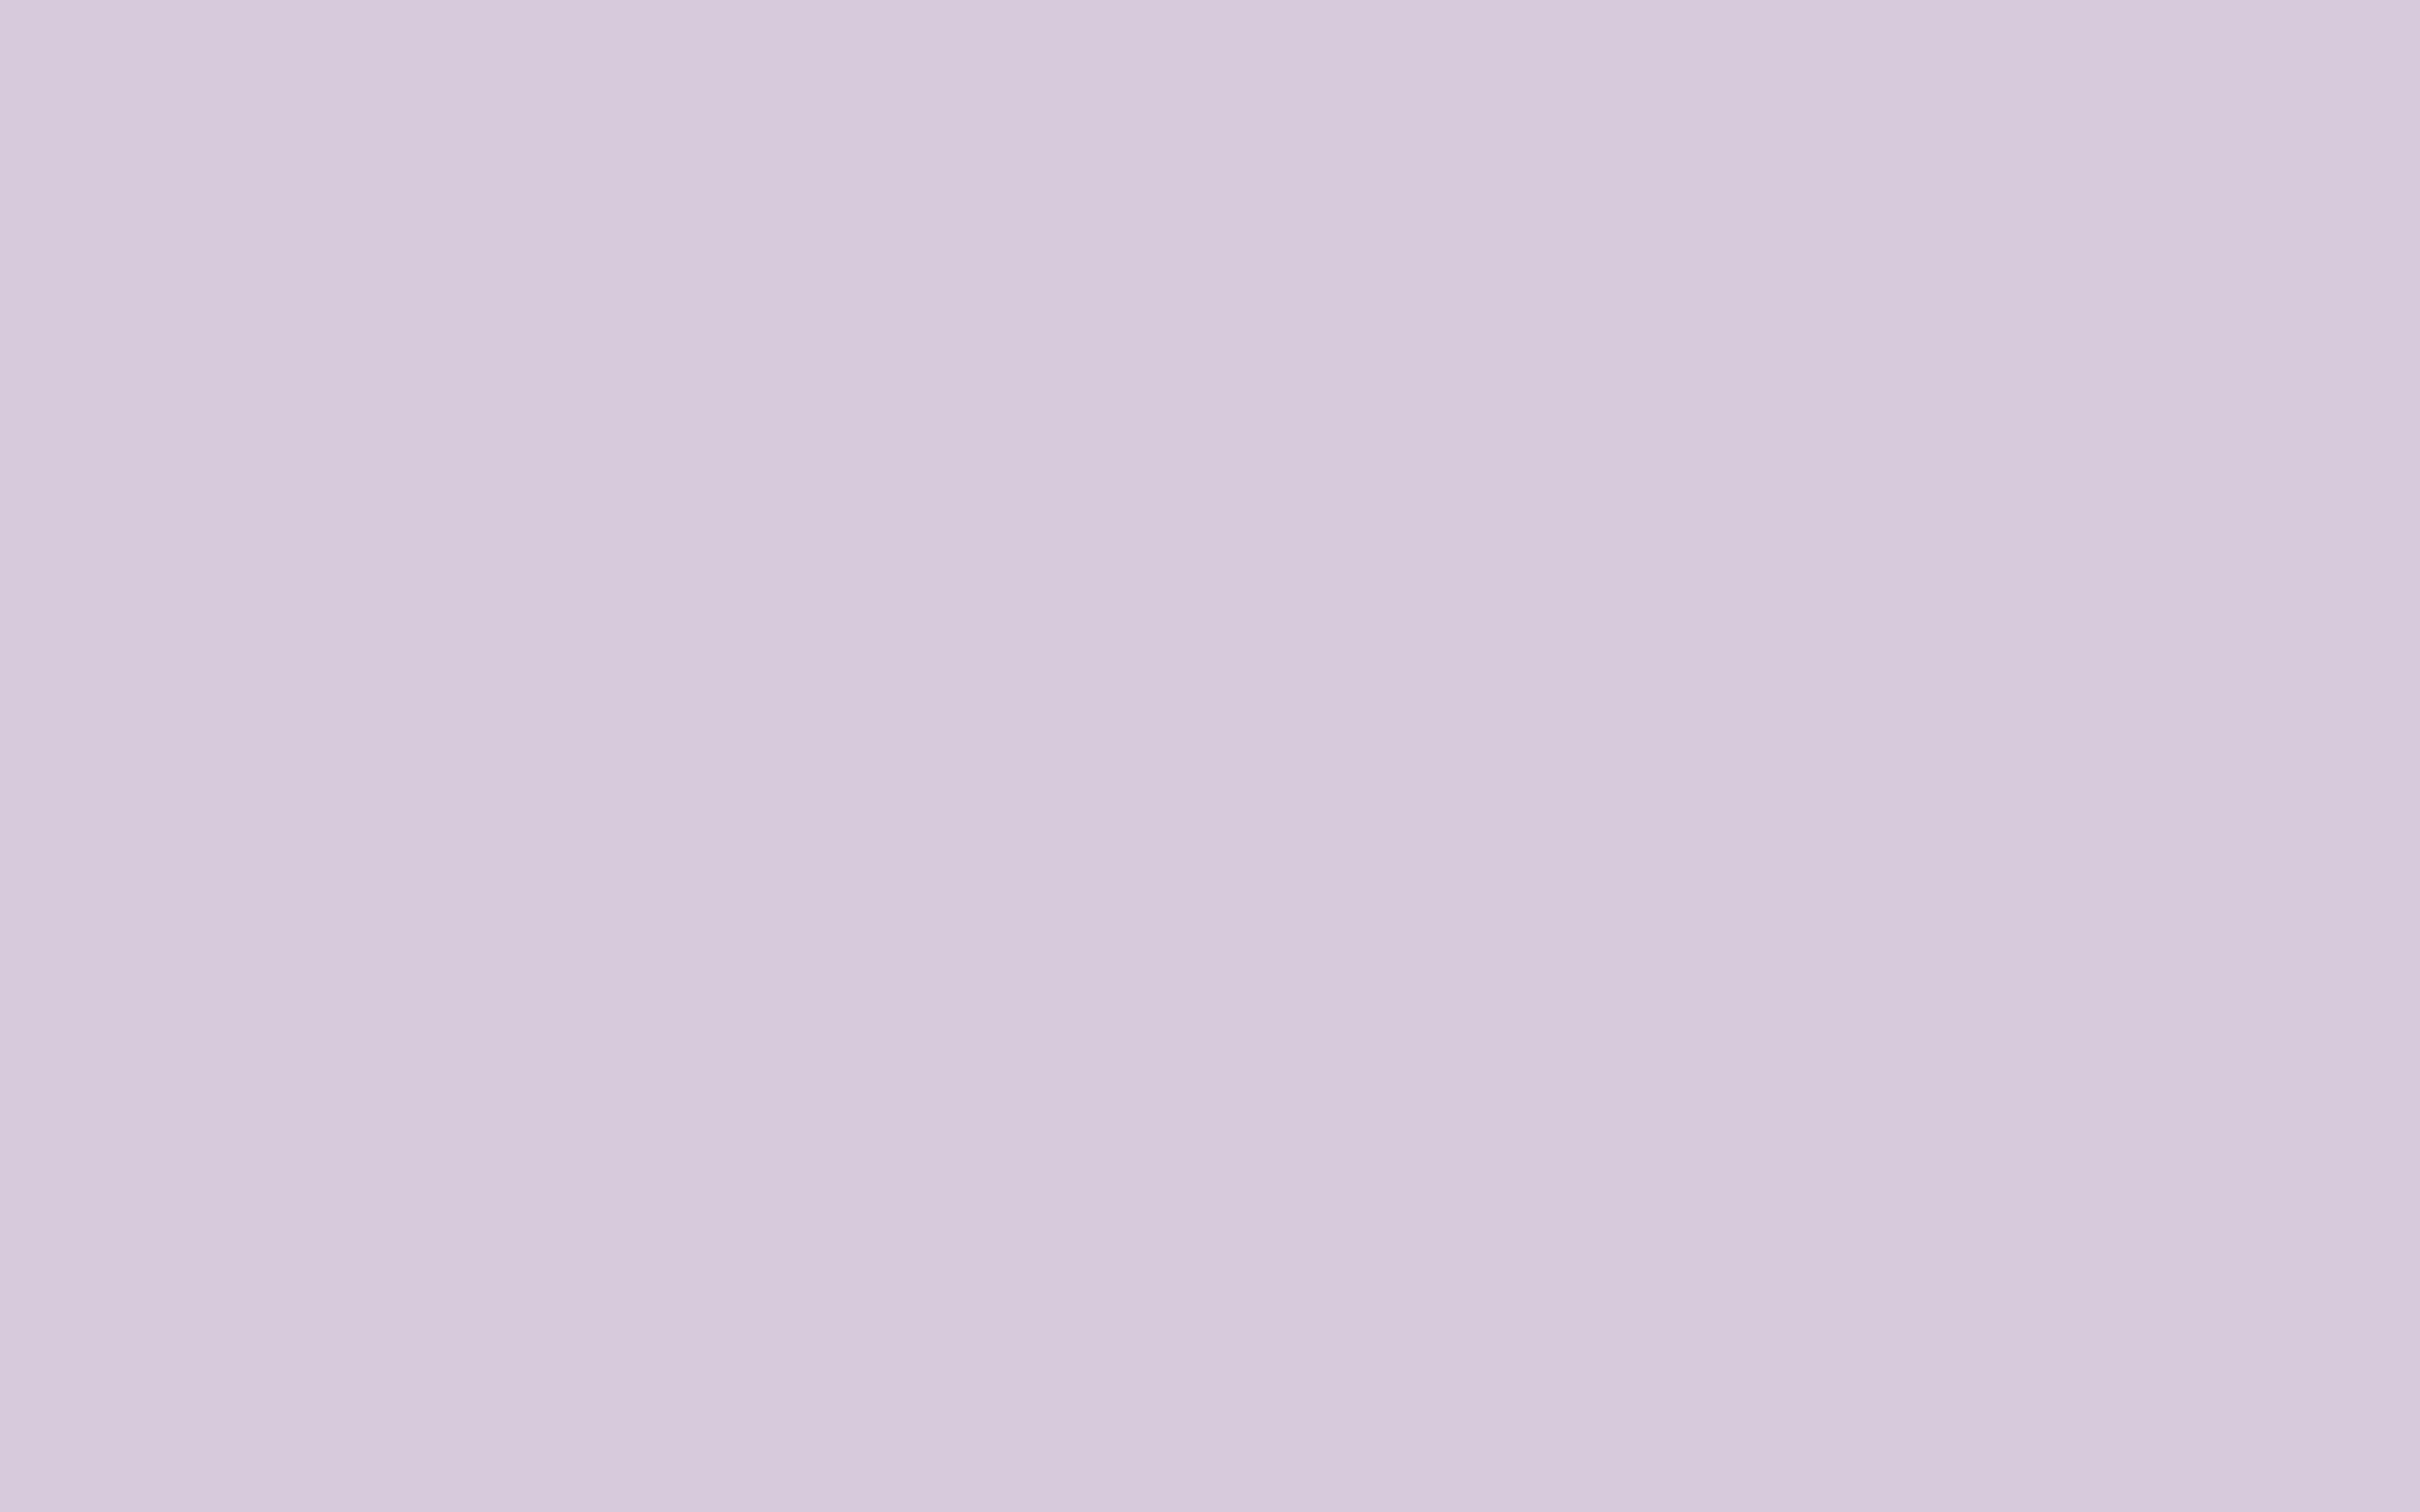 2560x1600 Languid Lavender Solid Color Background